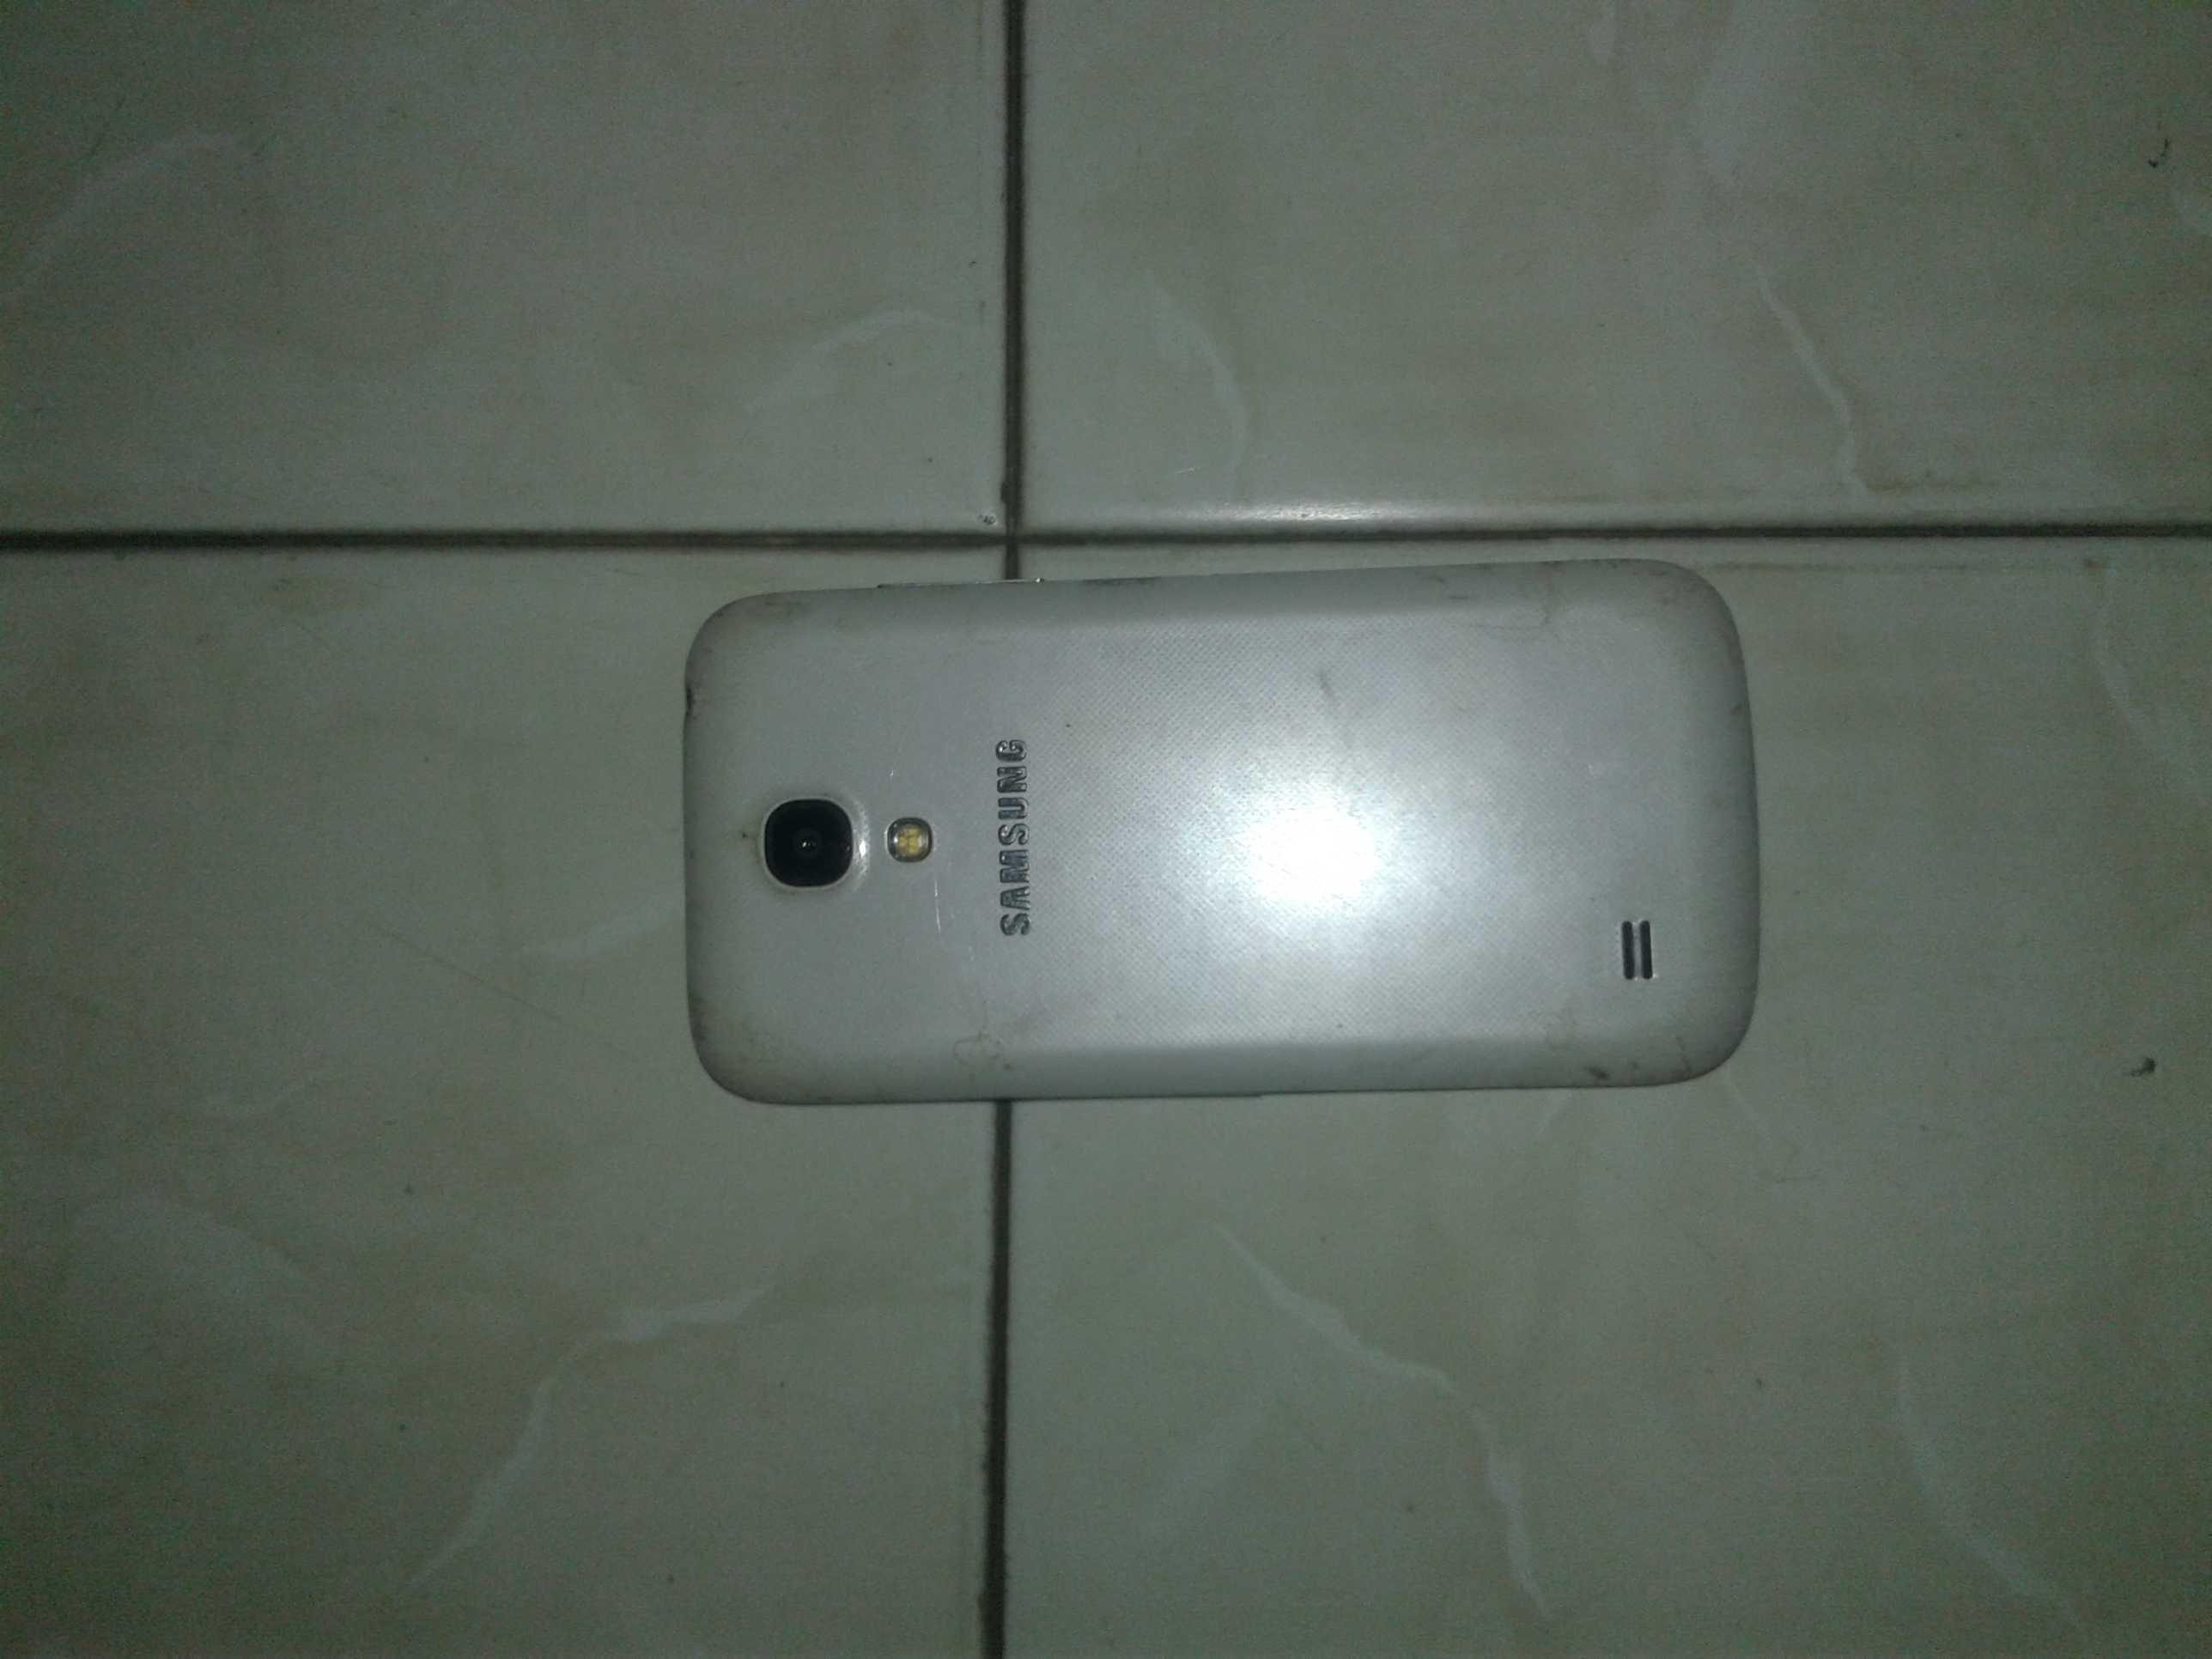 Galaxy s4 mini pantalla mala